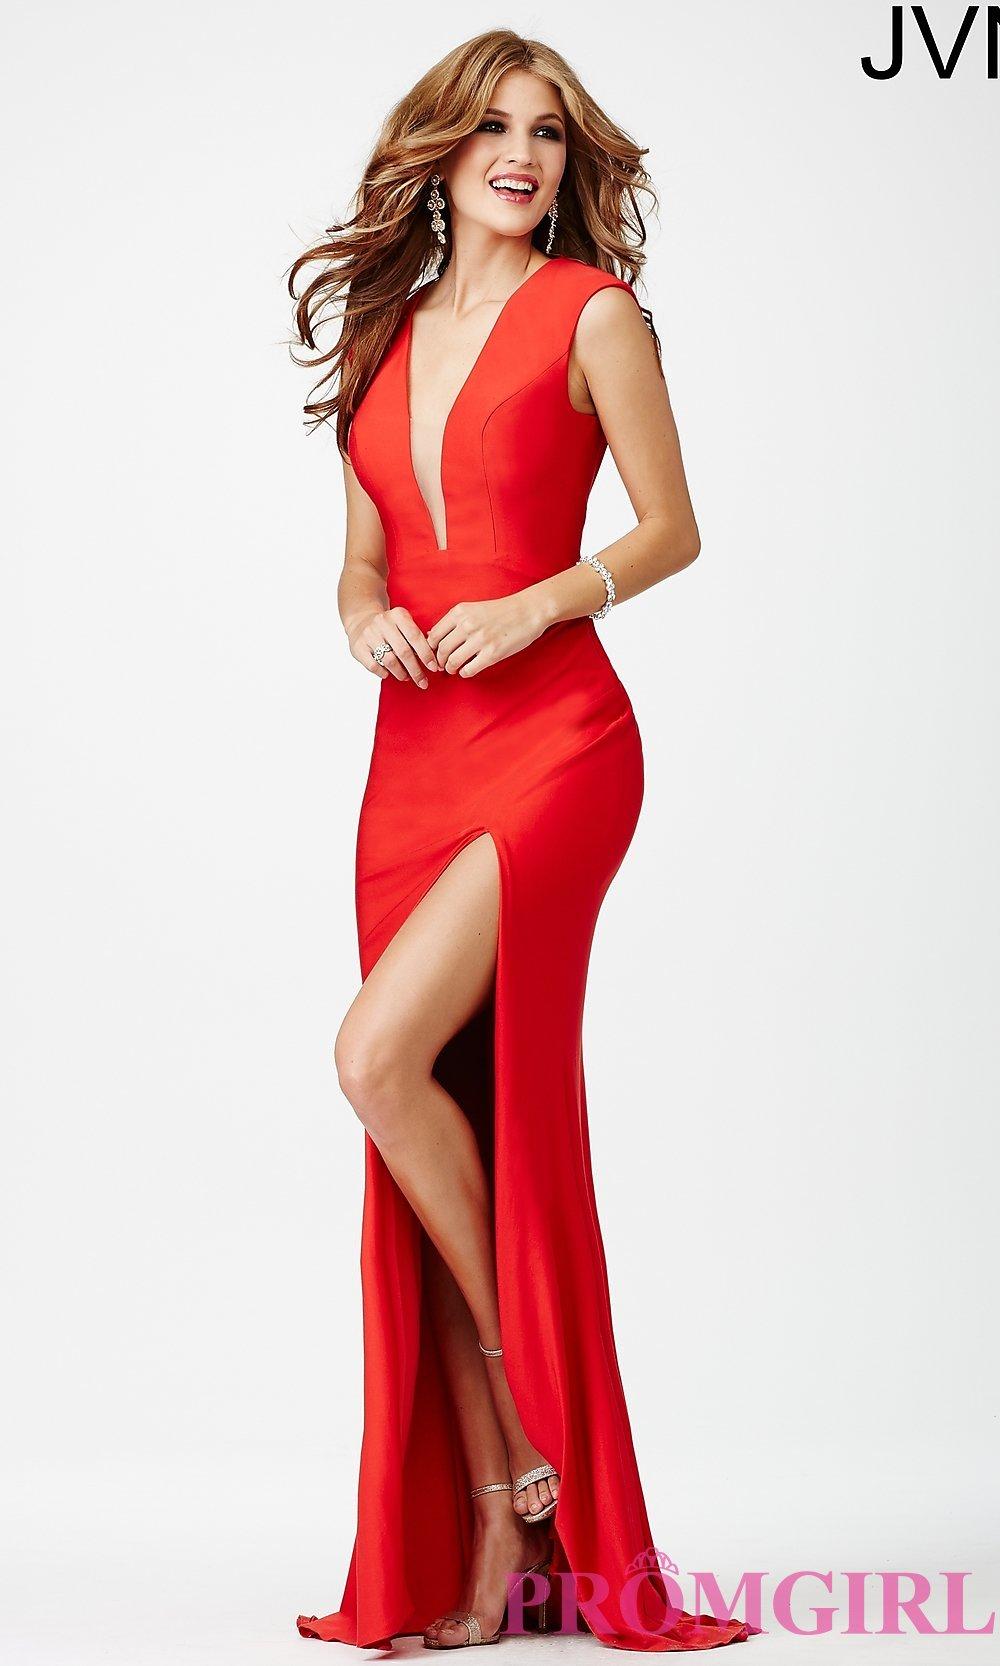 White Dress with Plunging Neckline | Plunging Neckline Dress | Burgundy V Neck Dress